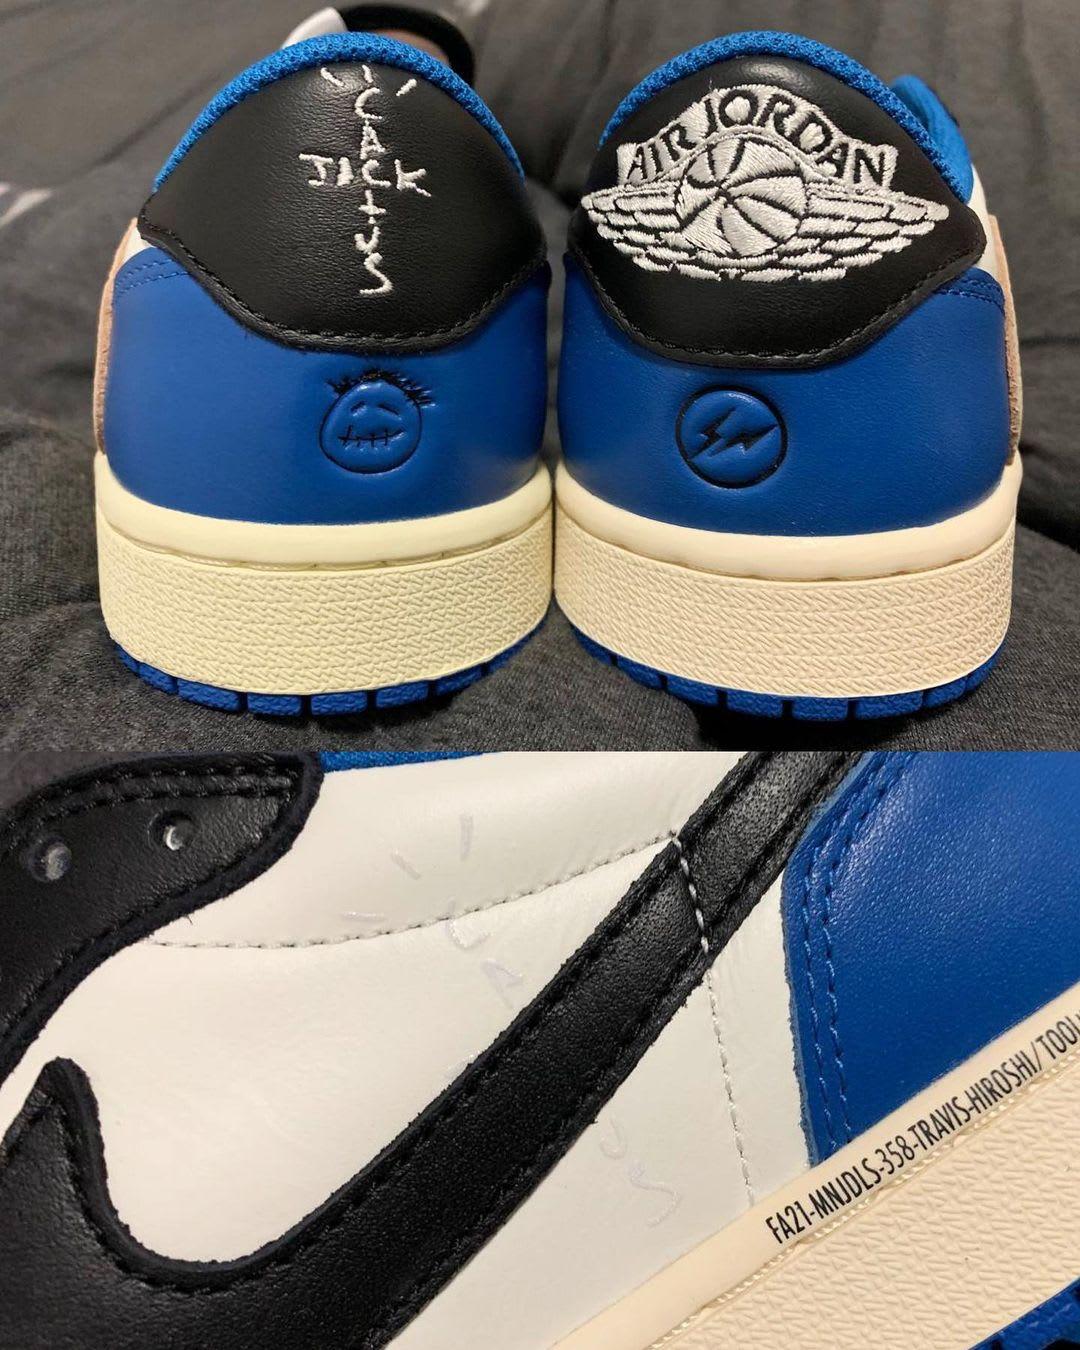 Fragment x Travis Scott x Air Jordan 1 Low Heel